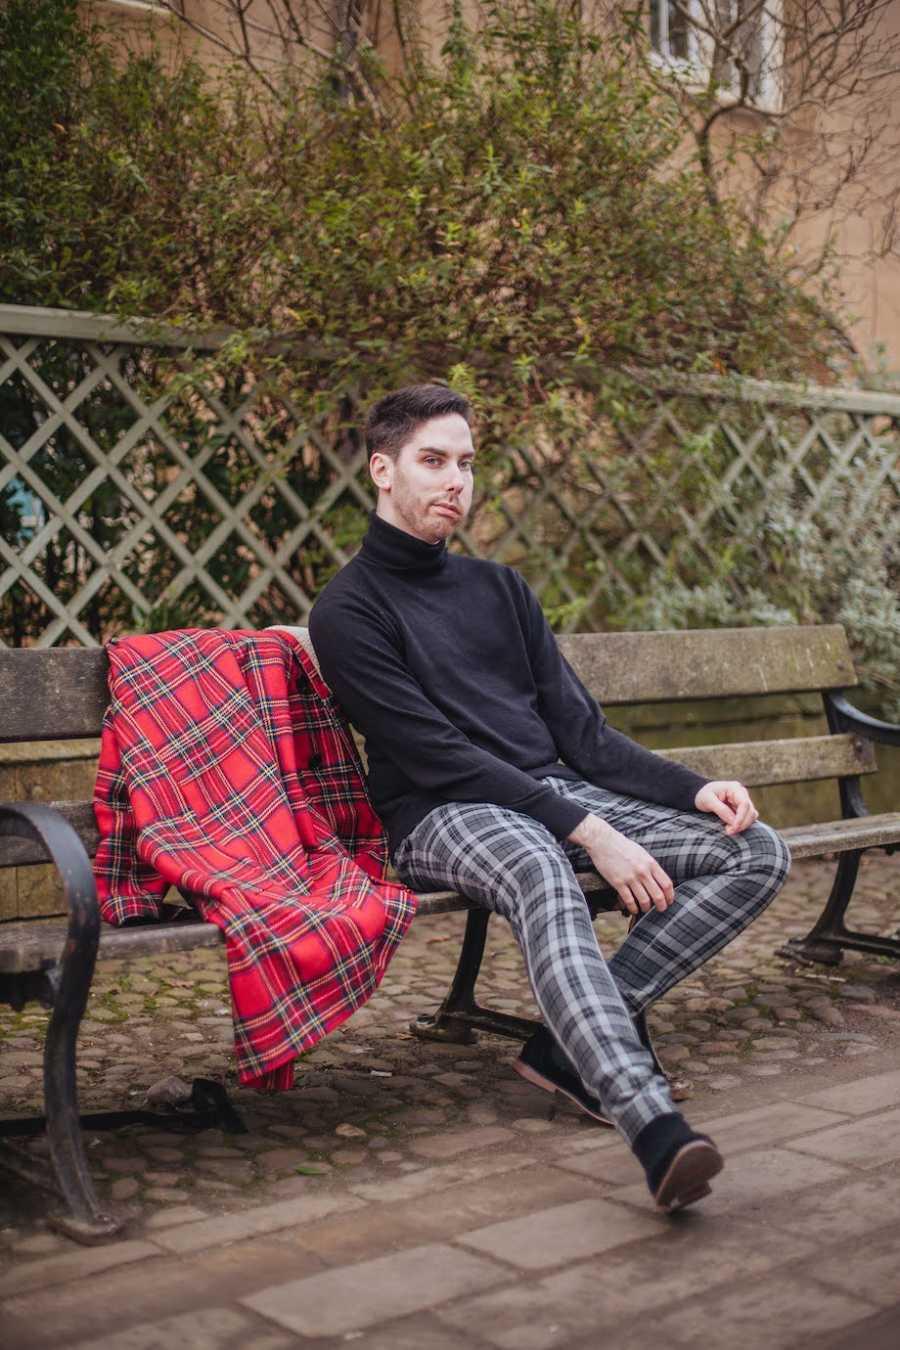 Scottish man sitting on bench